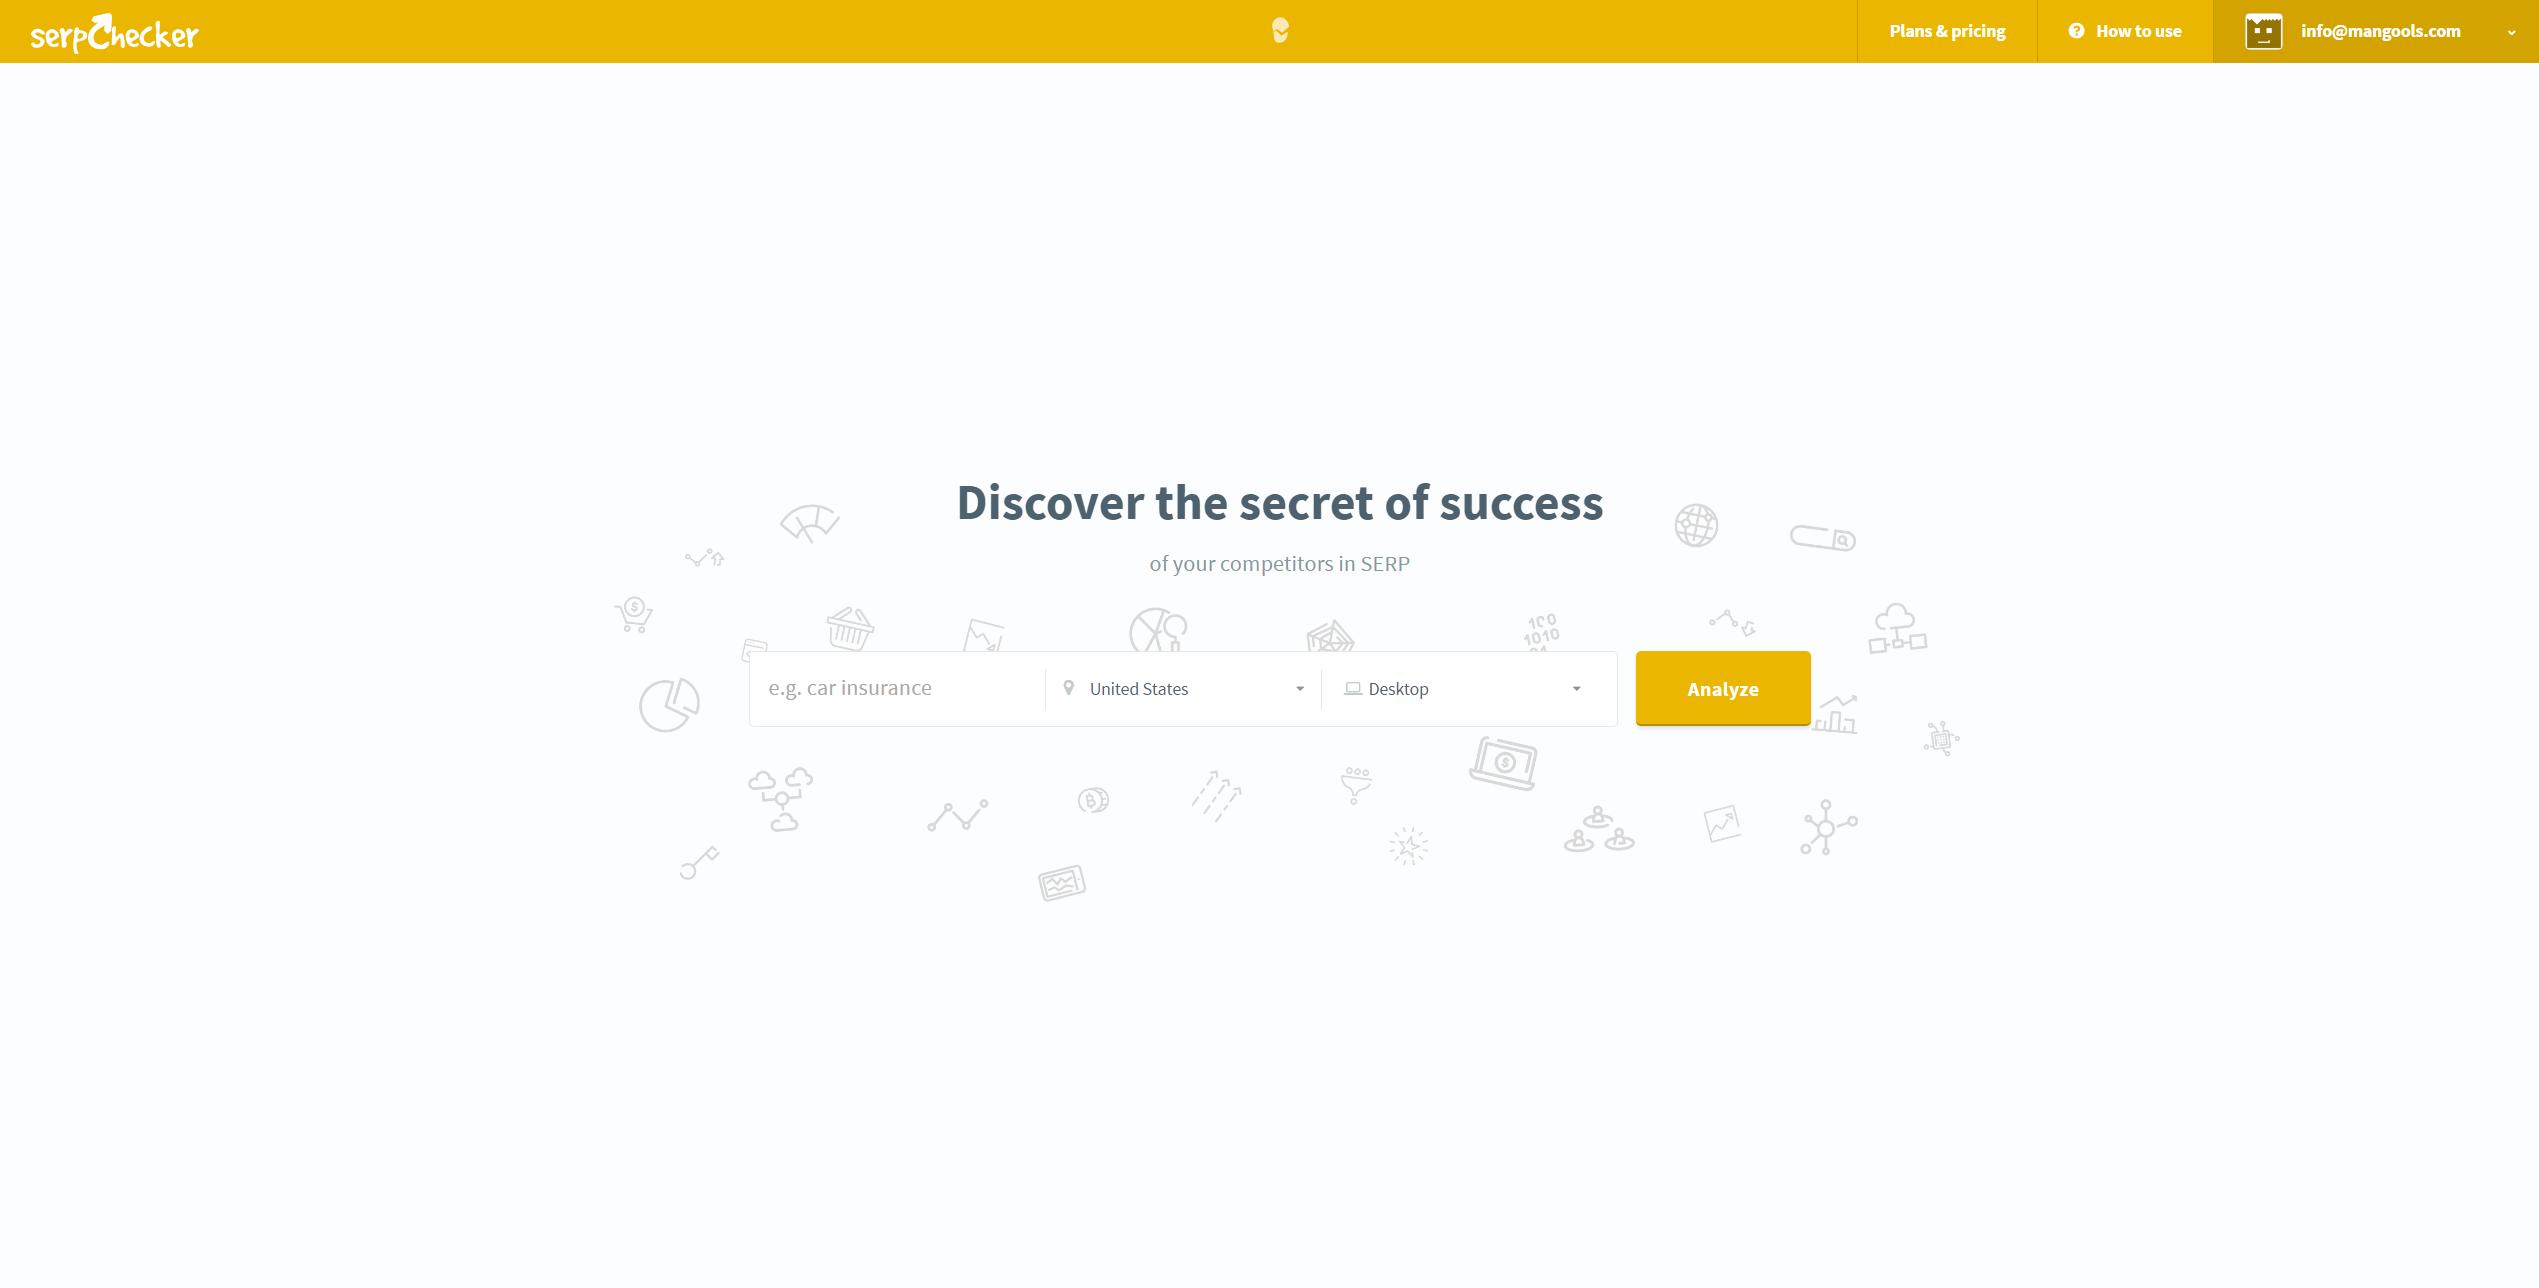 serpchecker-guide-app-landing-page